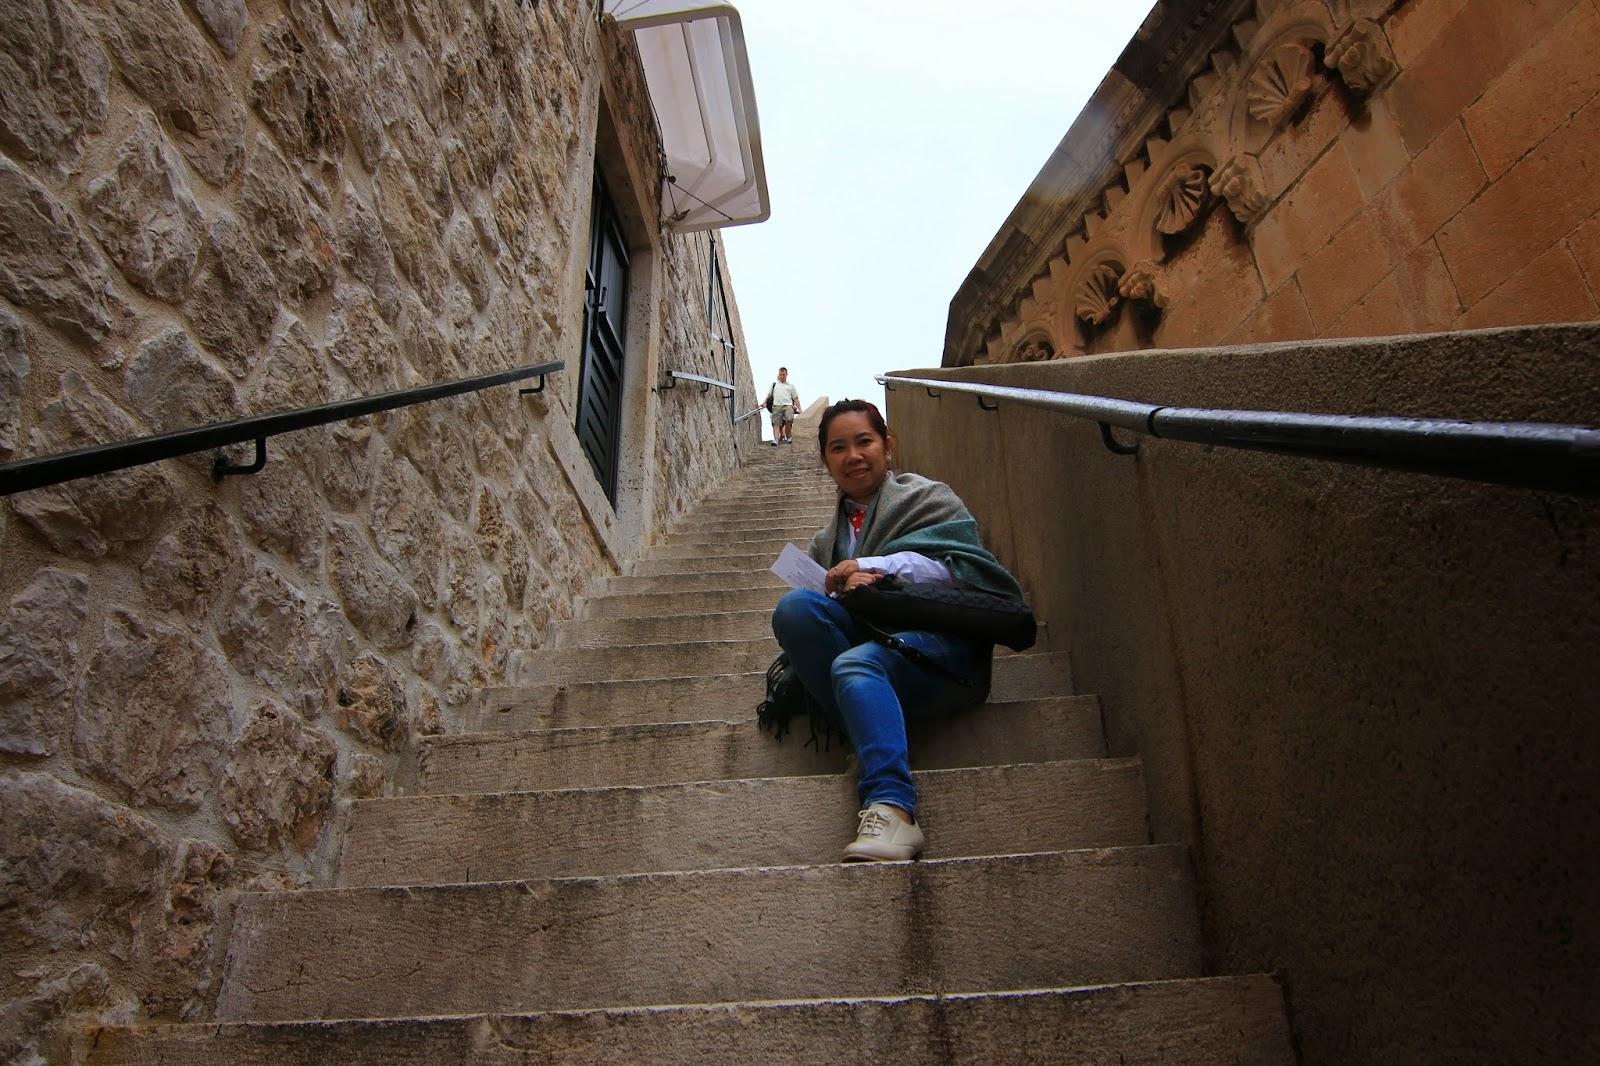 Walls of Dubrovnik 杜布羅夫尼克城牆